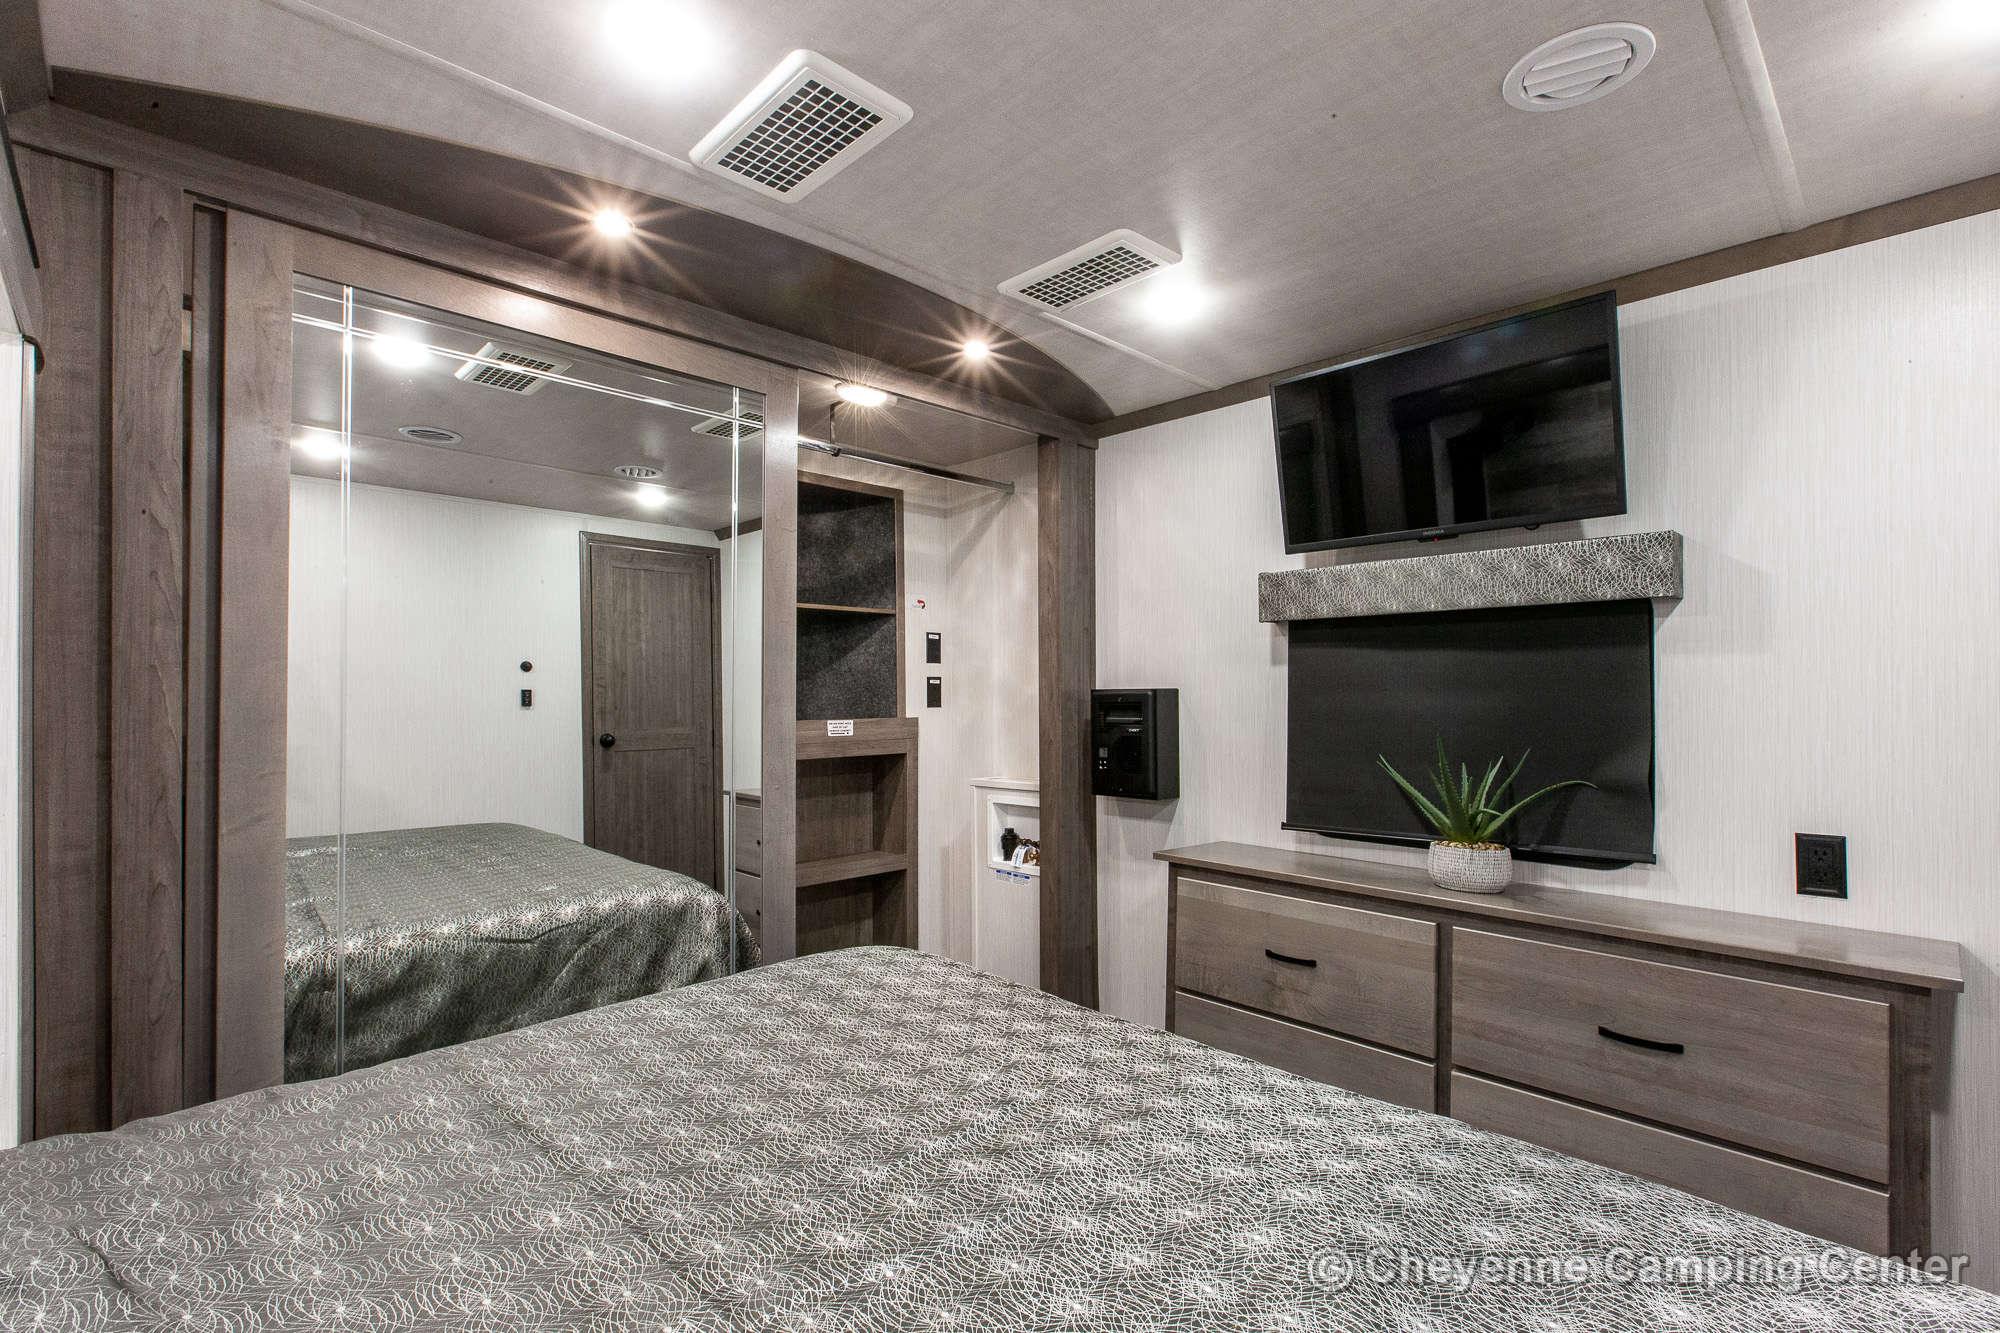 2022 Forest River Cedar Creek 311RL Fifth Wheel Interior Image